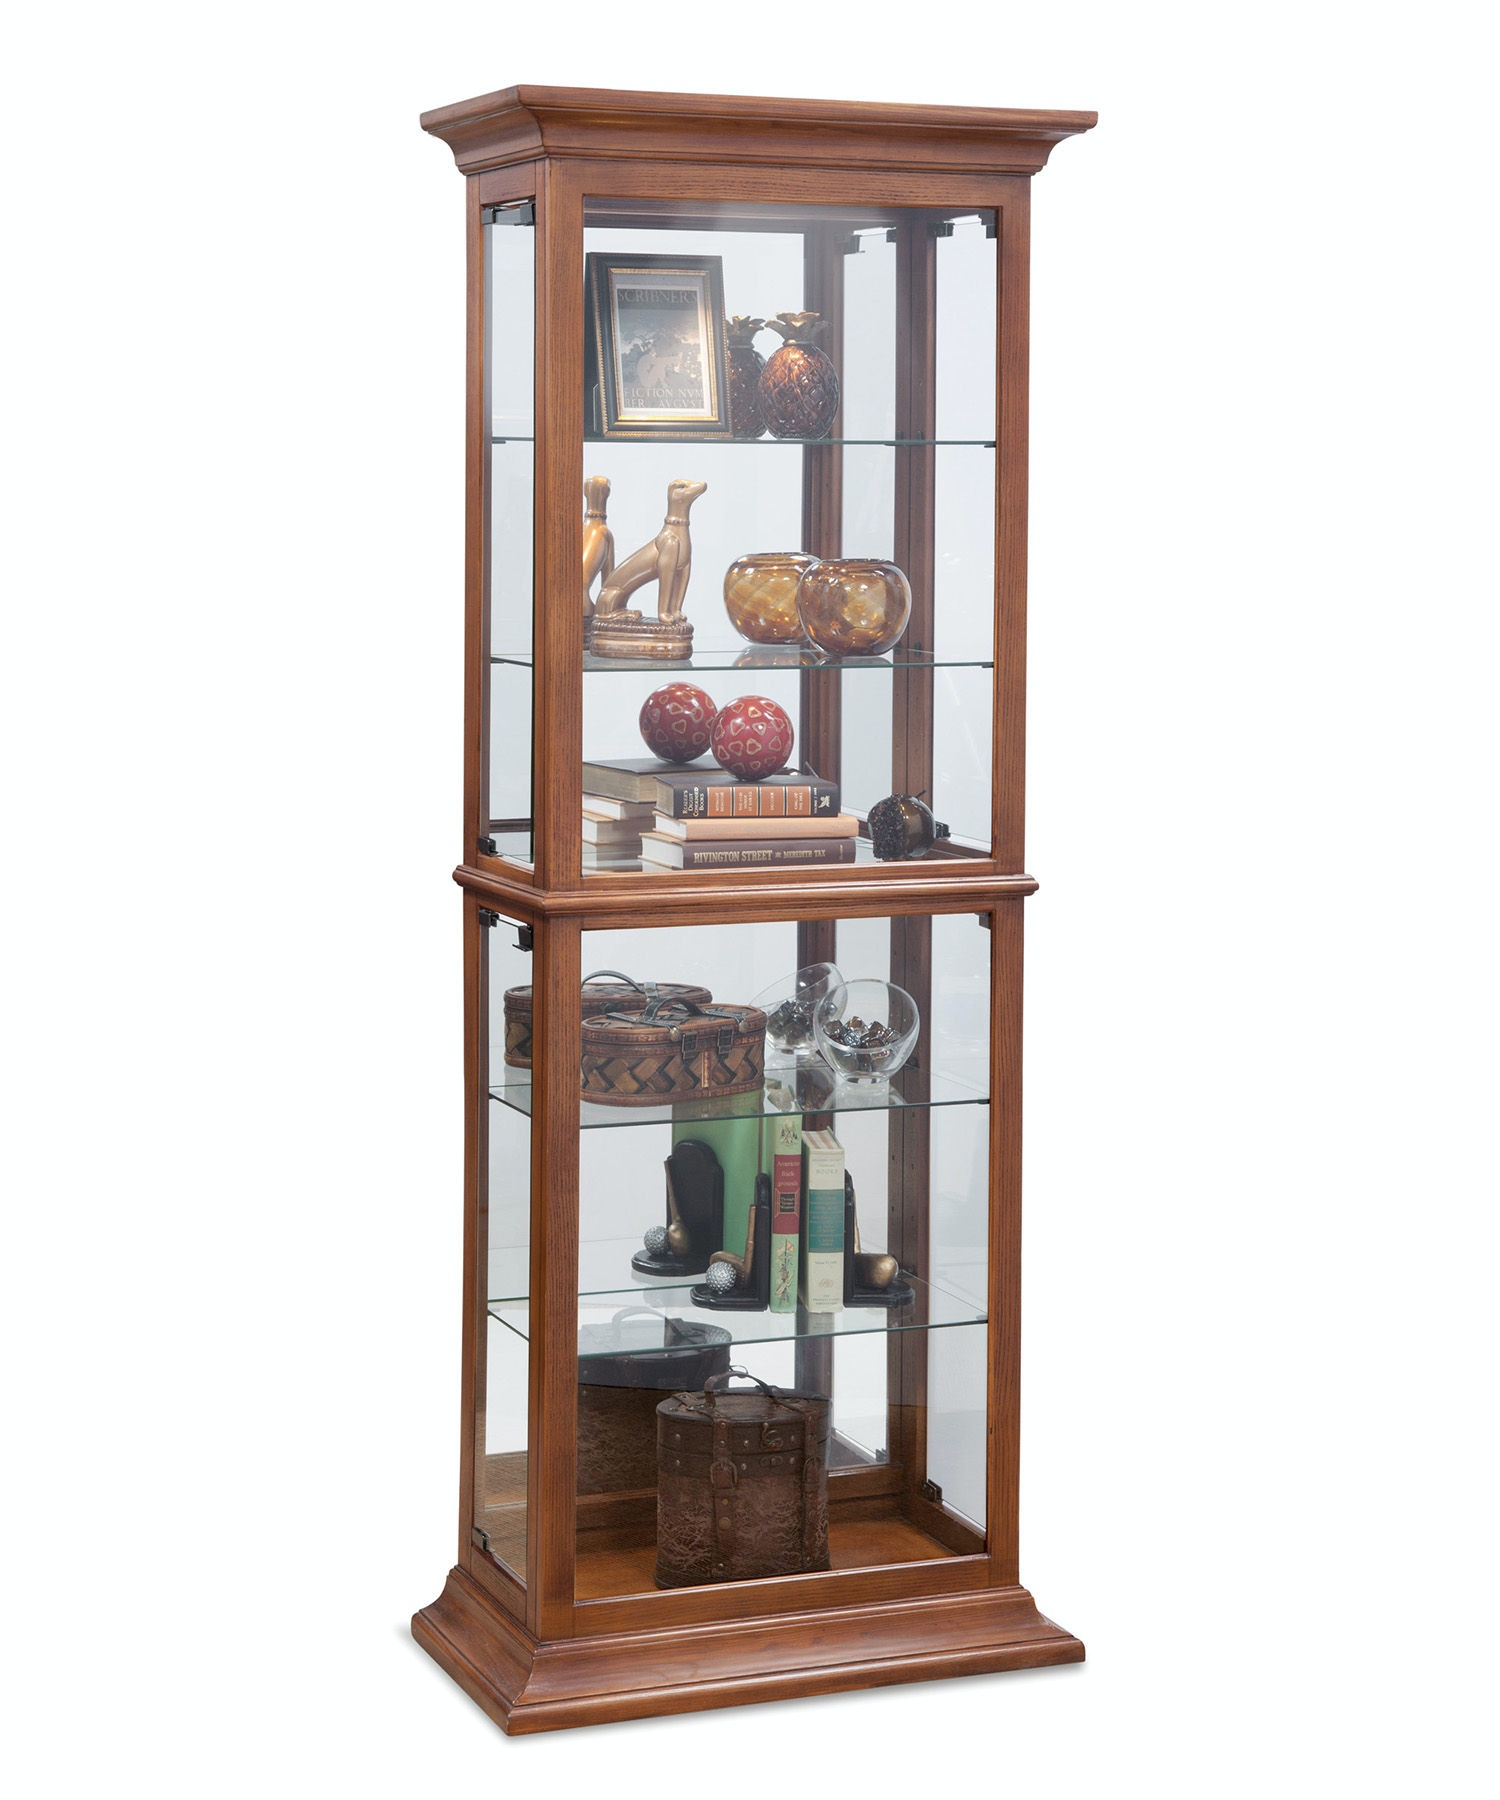 Philip Reinisch Fairfield I Curio Cabinet 12351